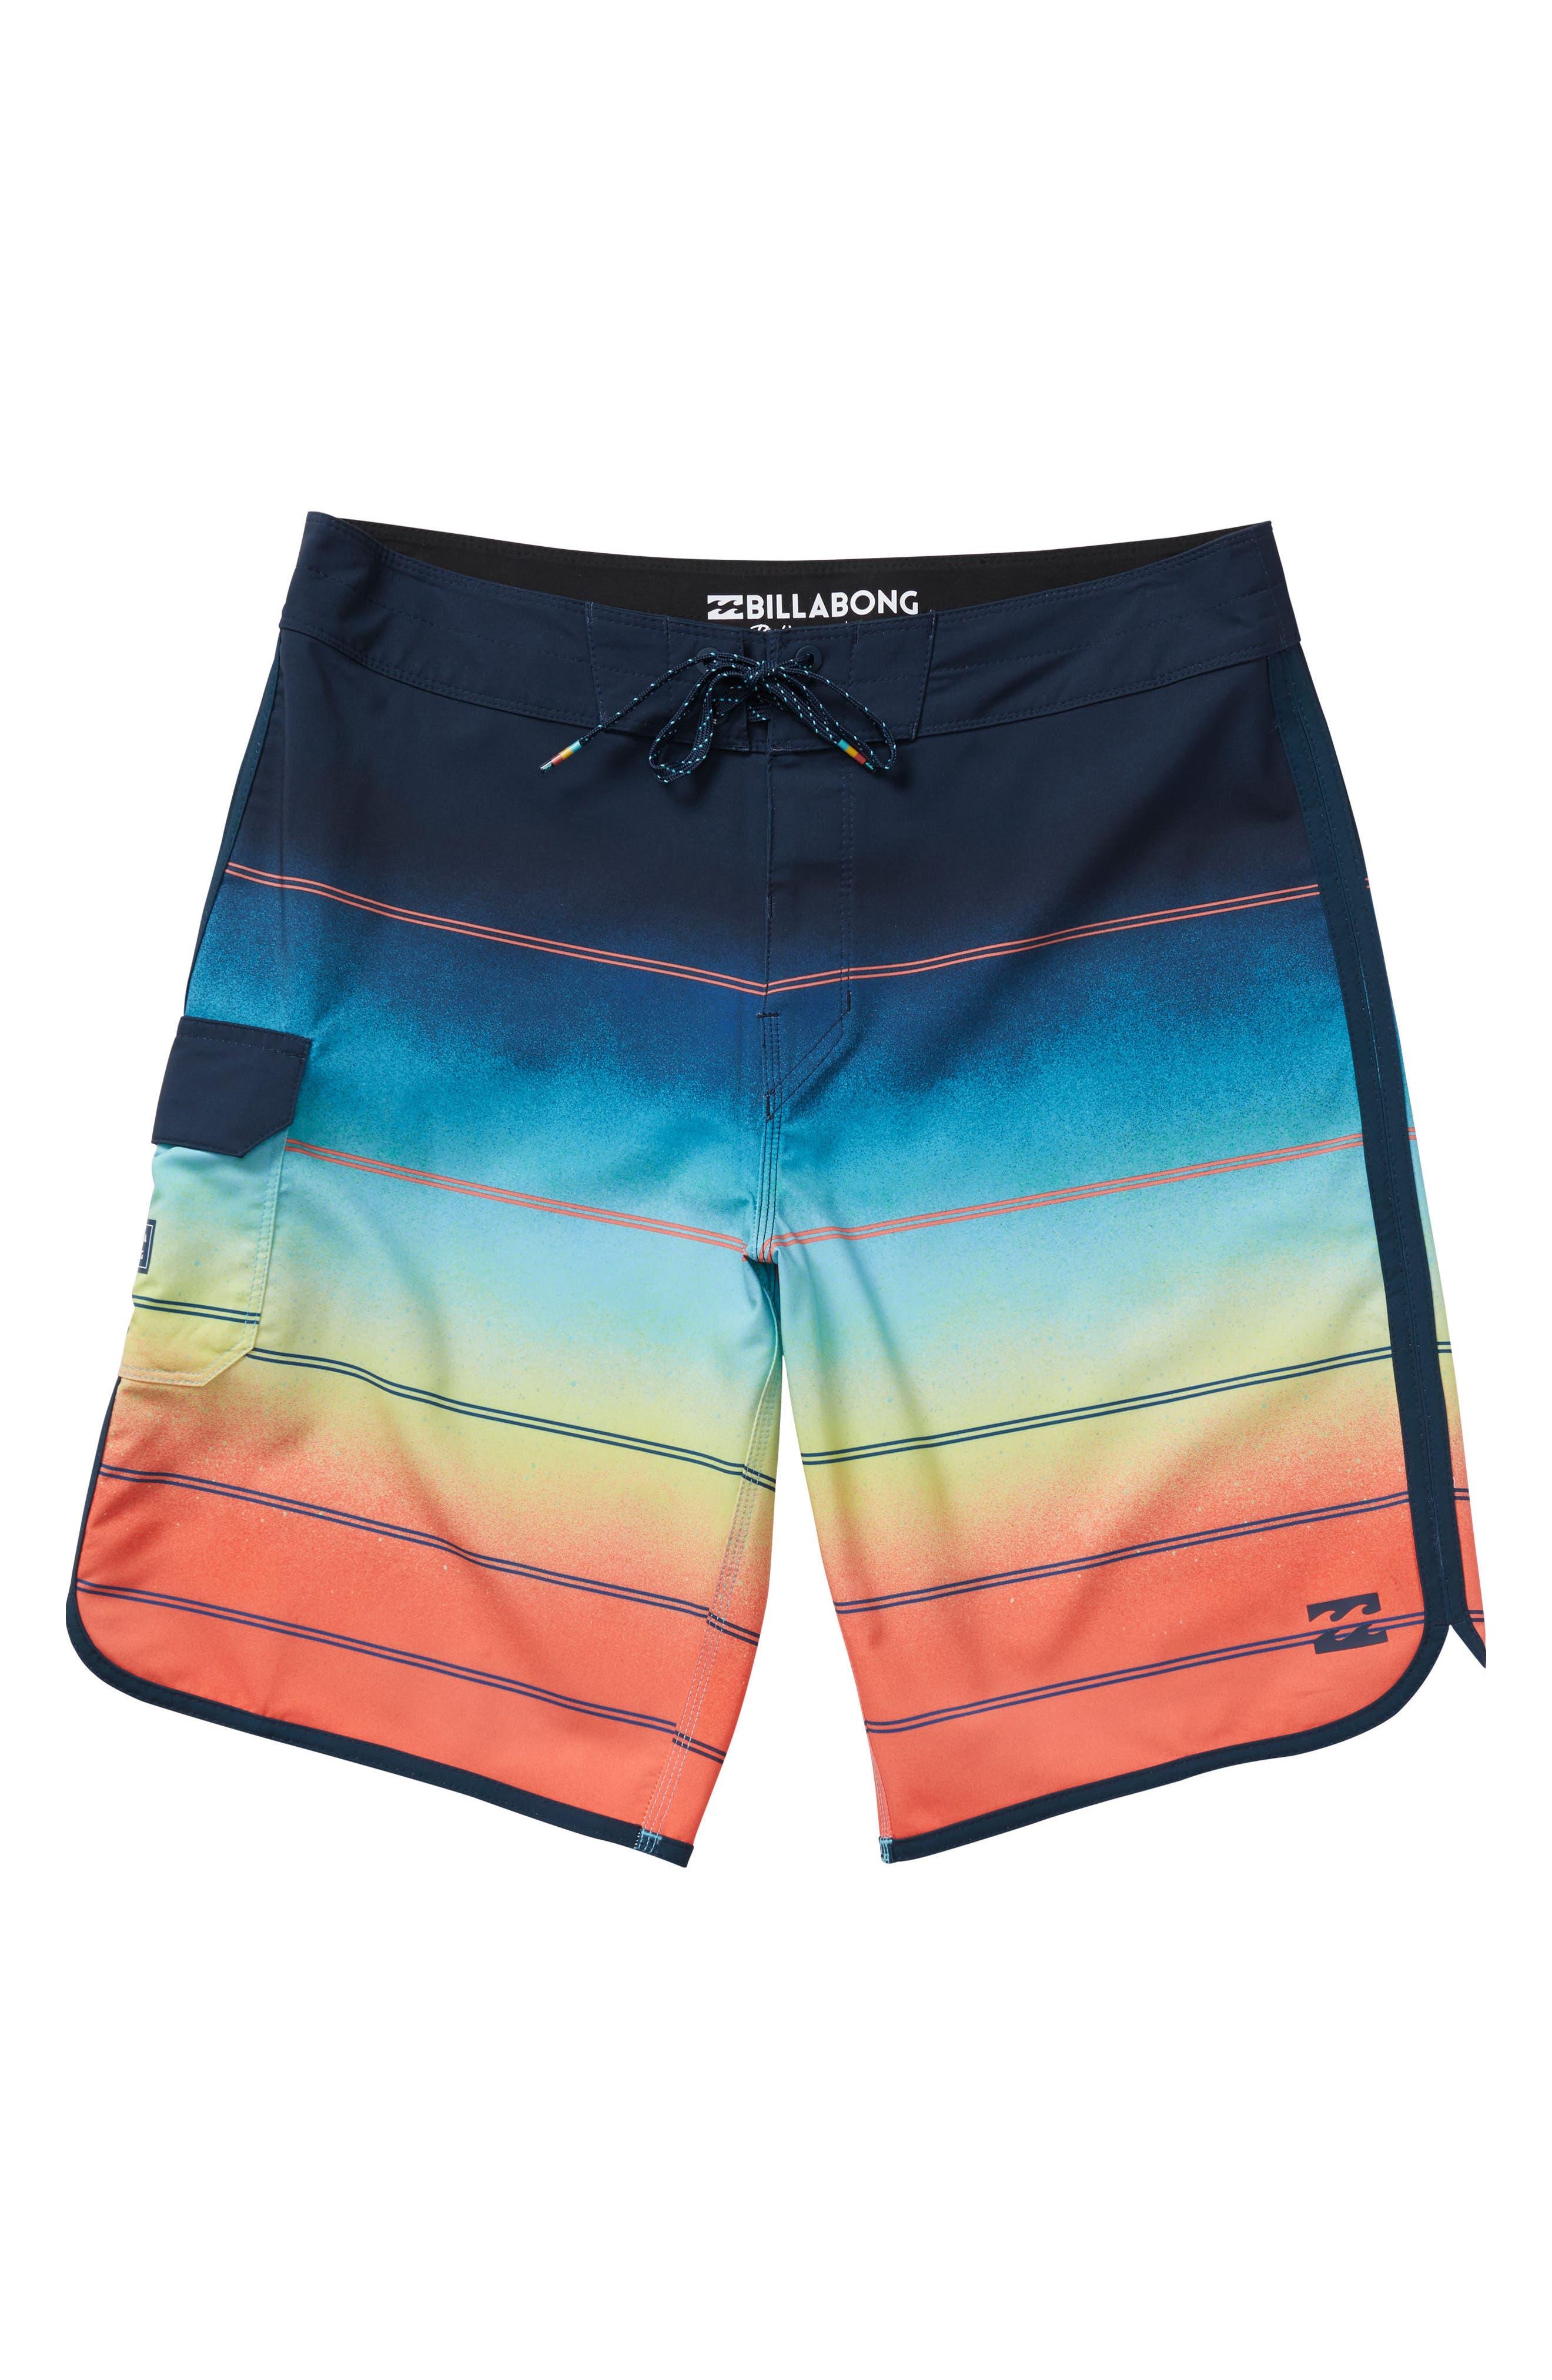 73 X Stripe Board Shorts,                             Main thumbnail 1, color,                             Orange